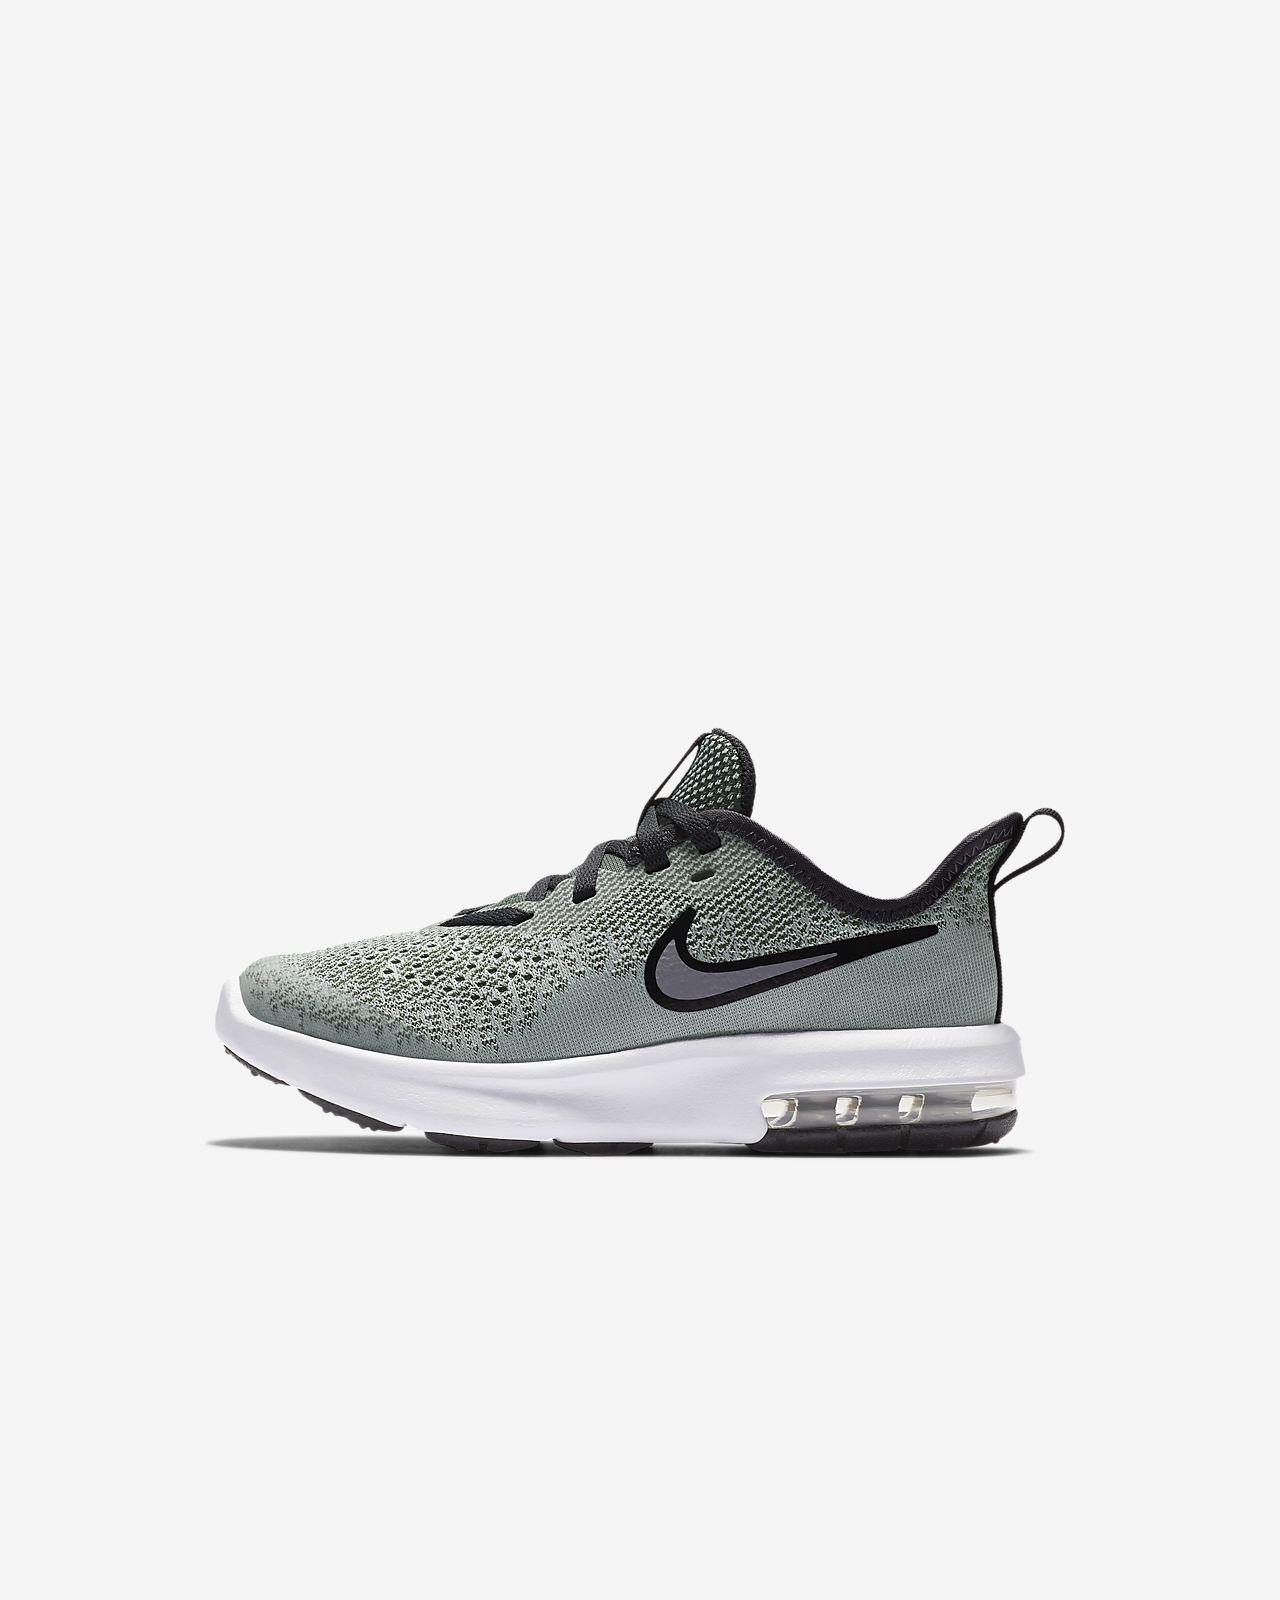 Nike Air Max Sequent 4-sko til små børn